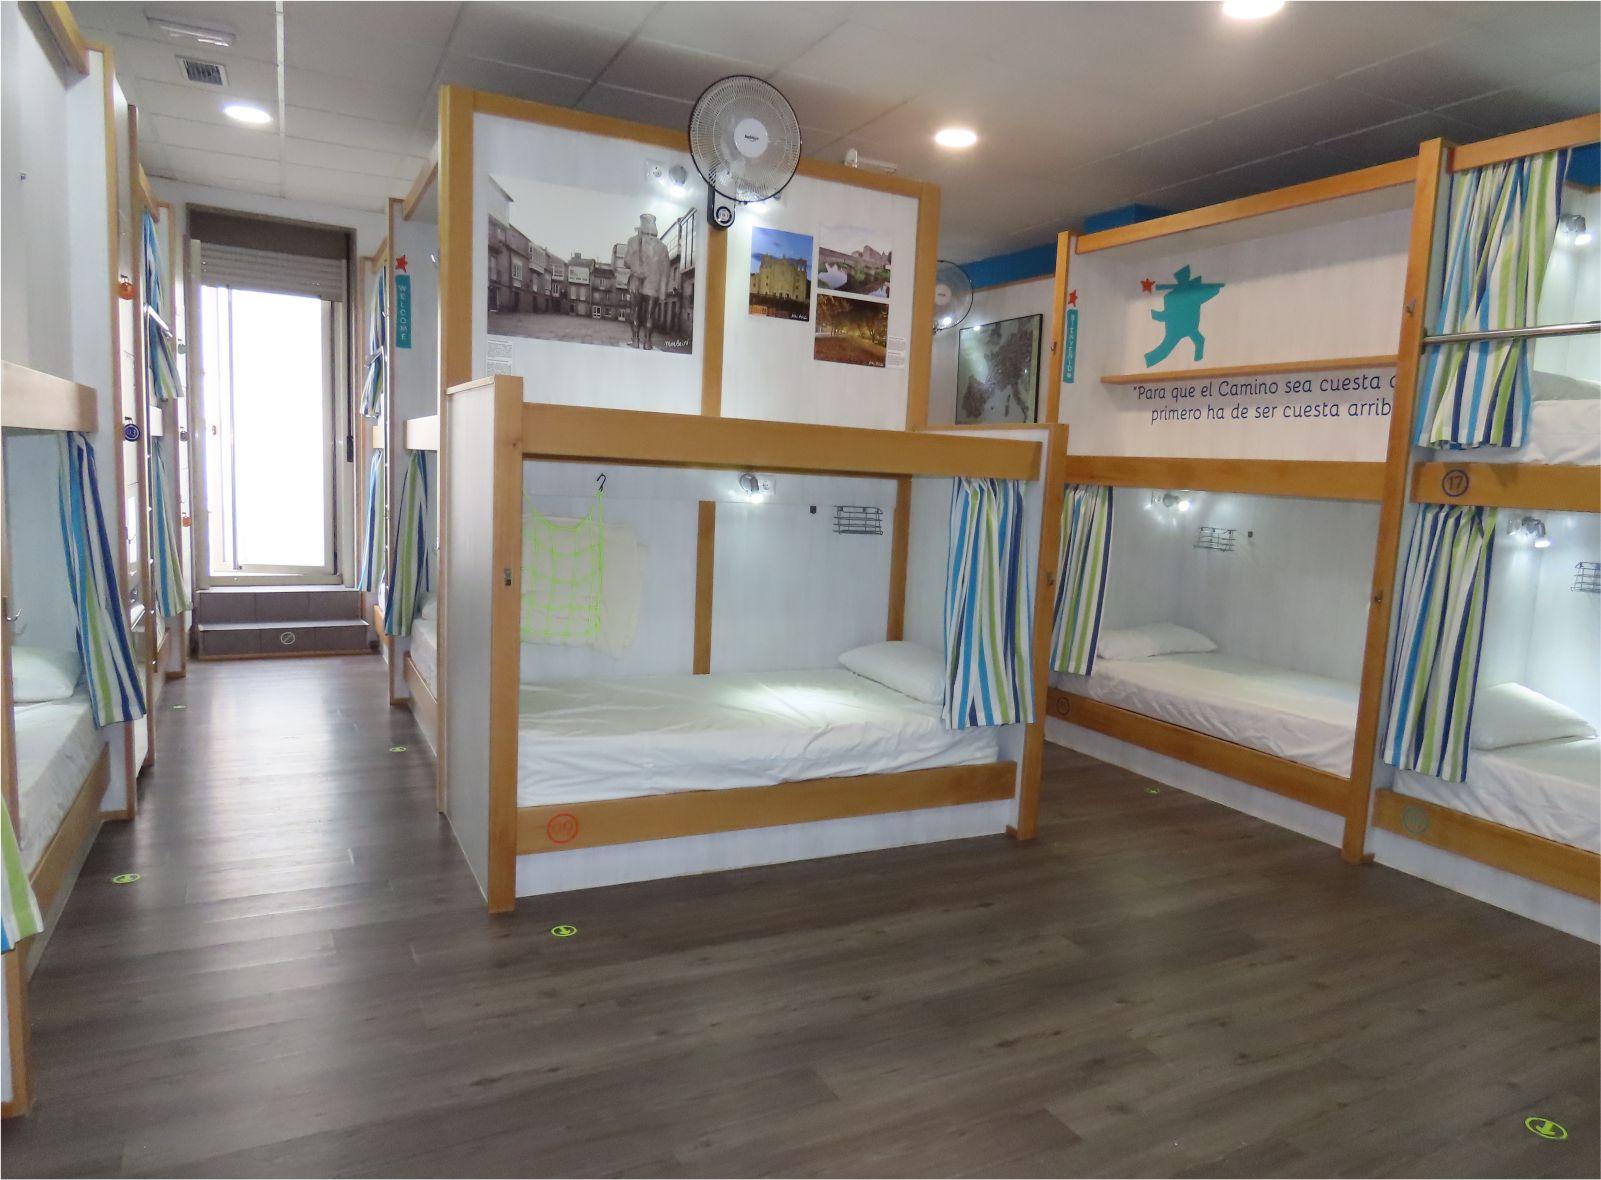 Literas - Bunk beds - Albergue Corredoiras